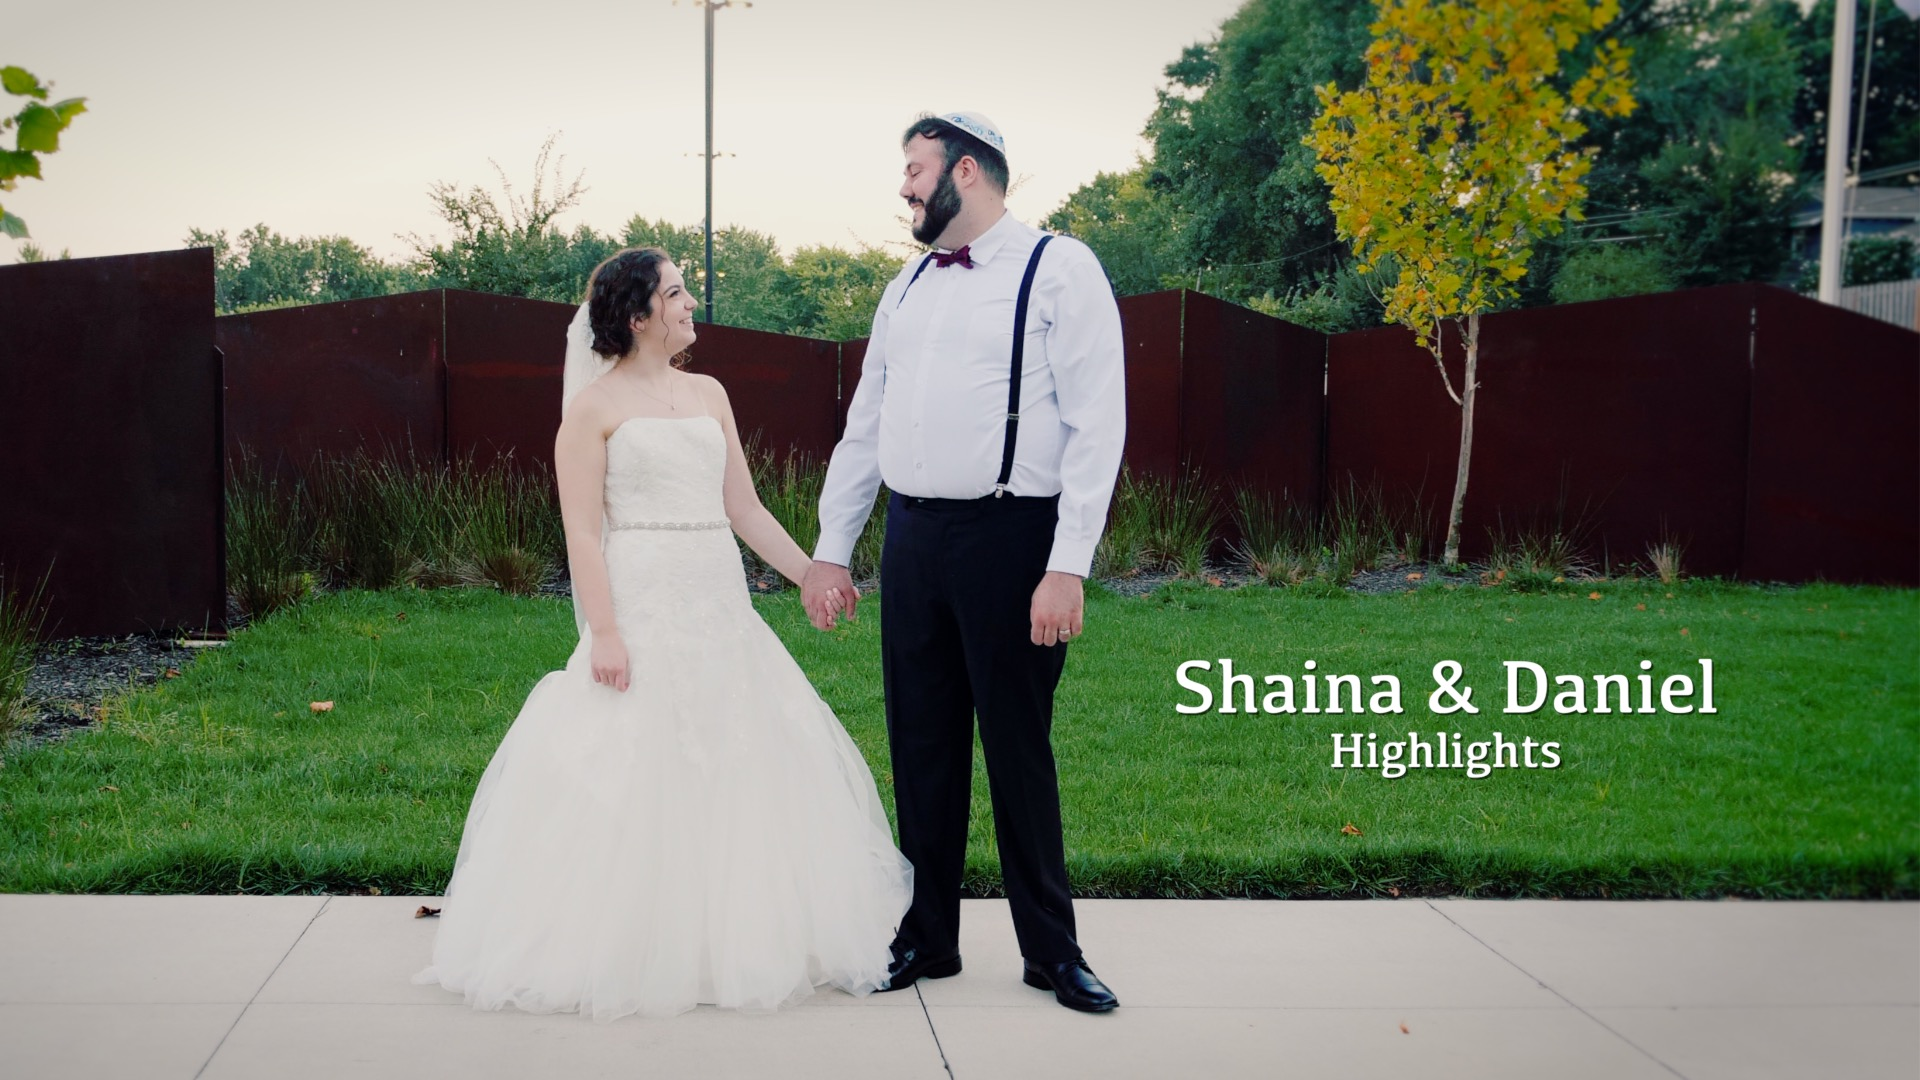 Shaina + Daniel | Overland Park, Kansas | Johnson County Arts and Heritage Center